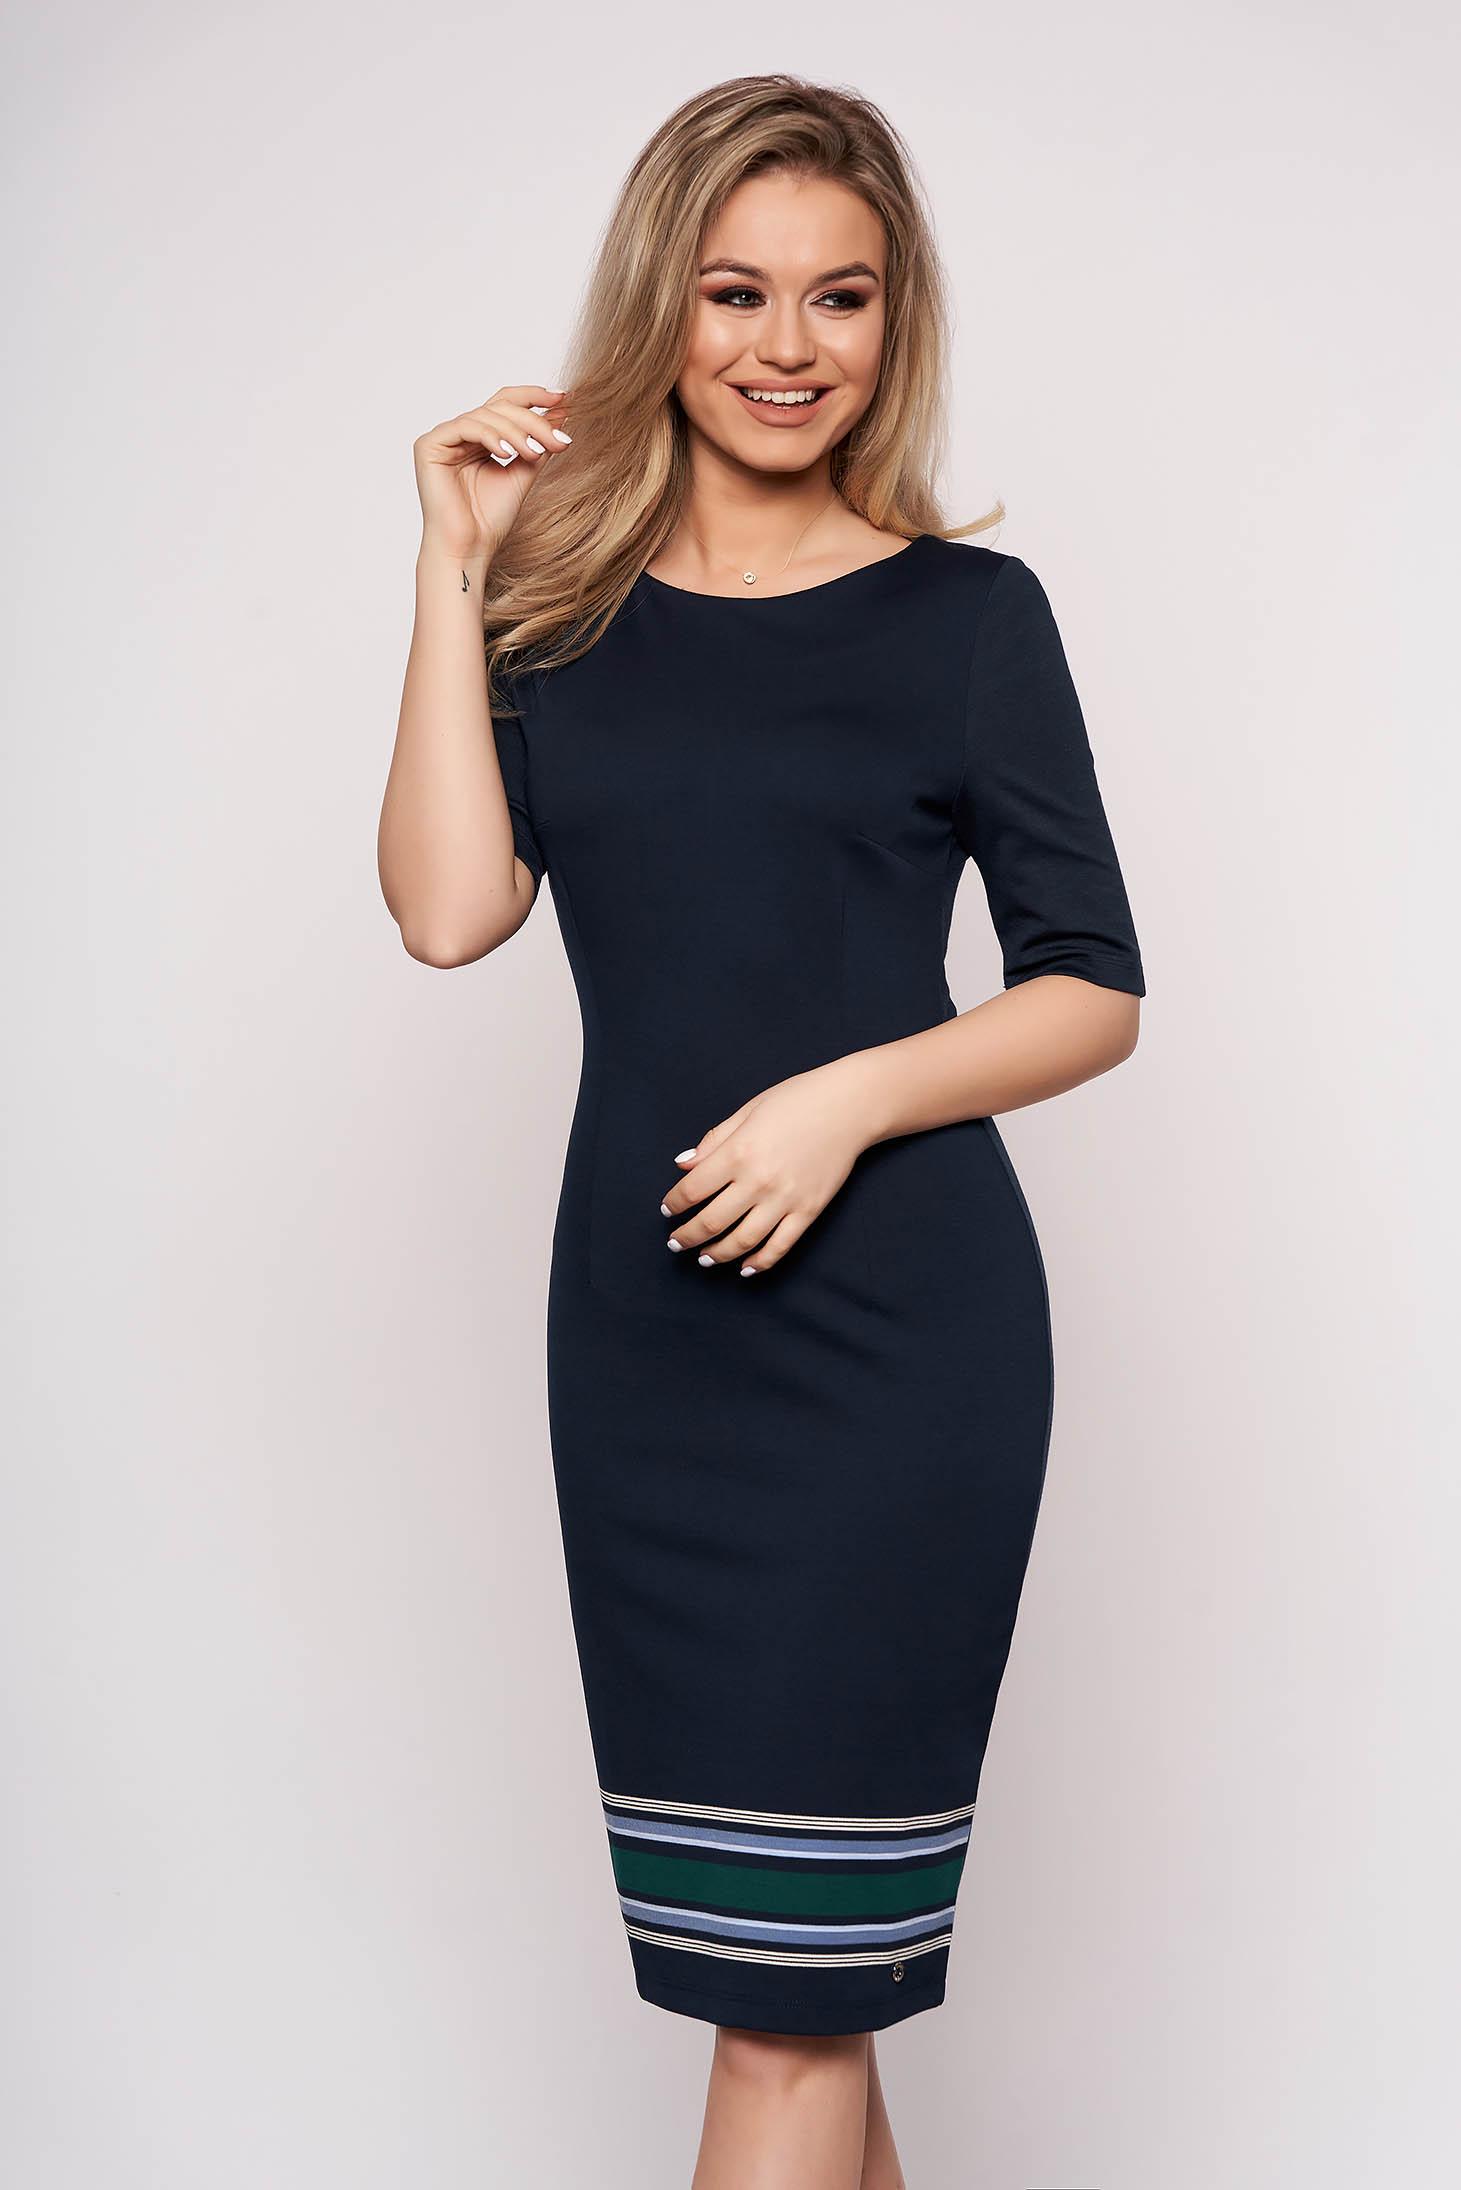 Darkblue dress horizontal stripes daily midi pencil with 3/4 sleeves